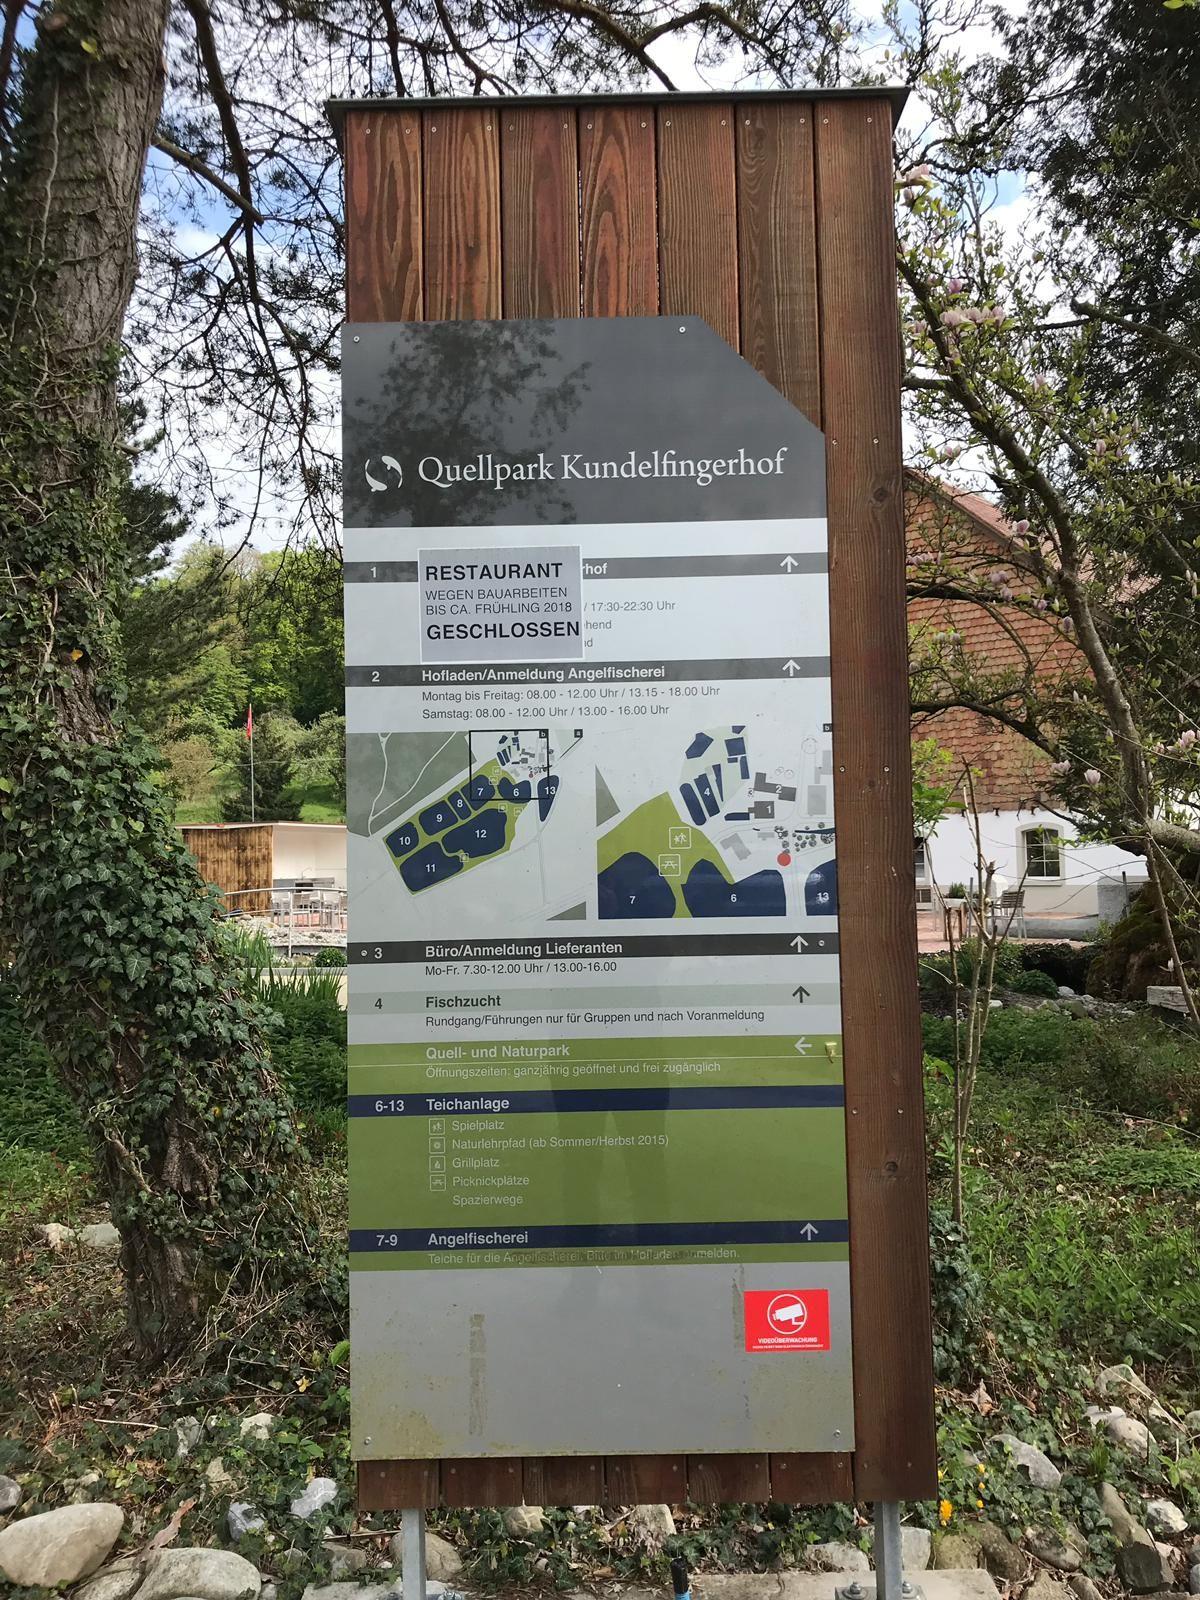 Kundelfingerhof